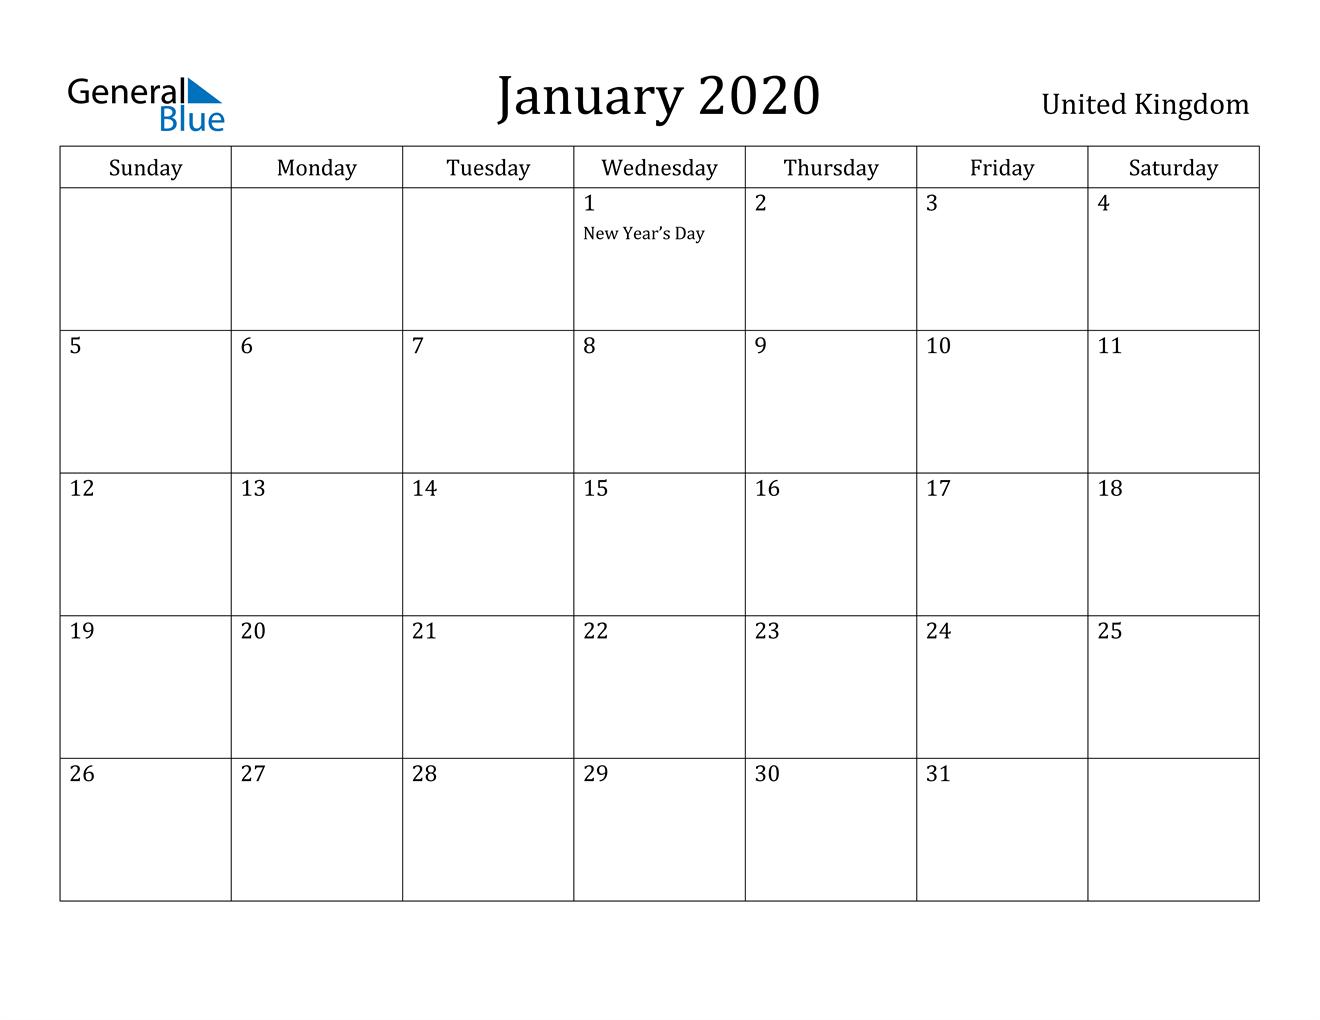 Image of January 2020 United Kingdom Calendar with Holidays Calendar